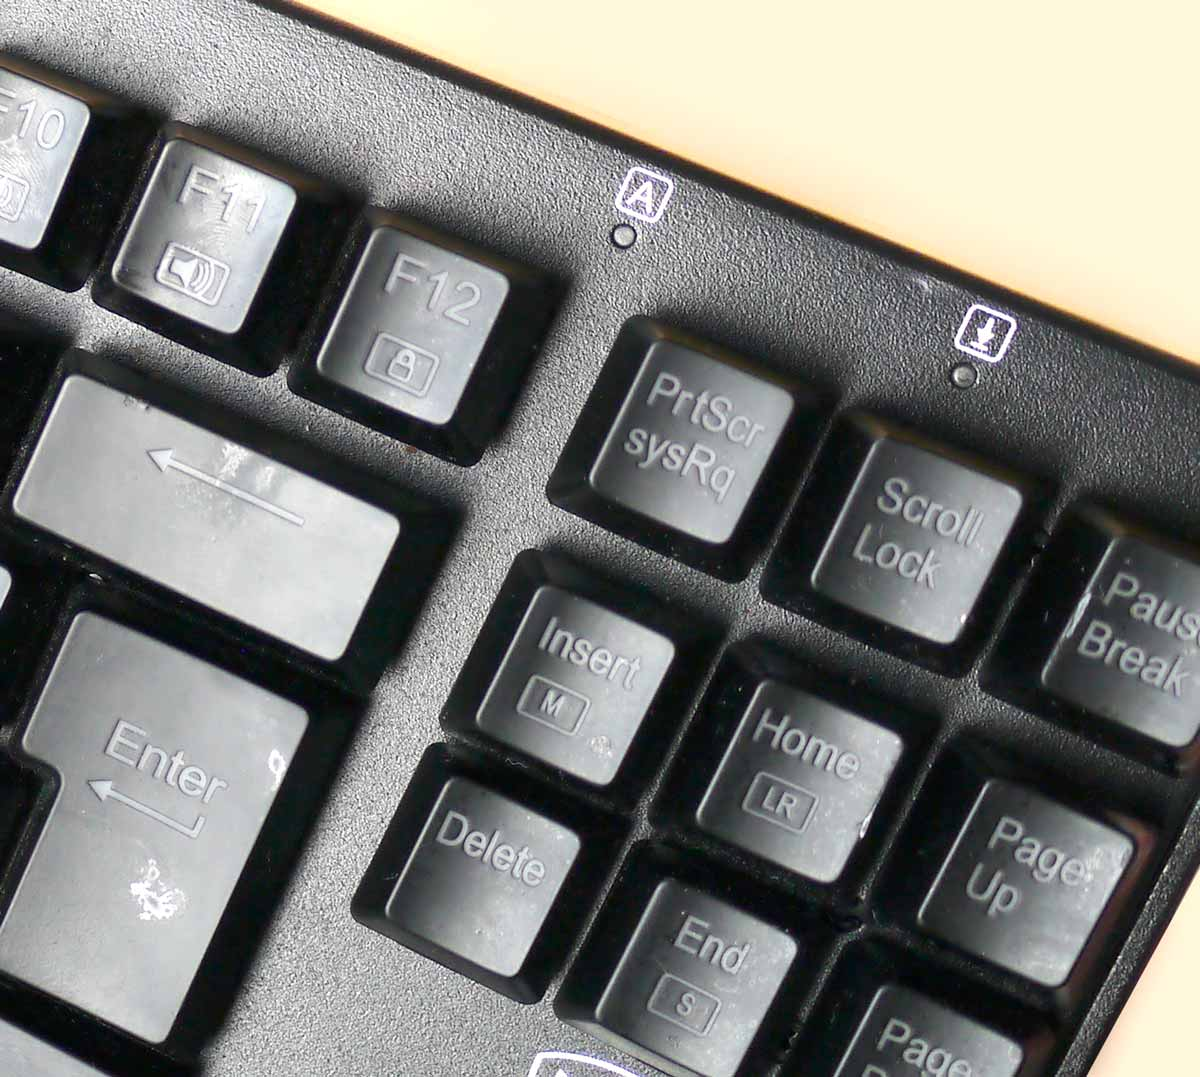 Scroll Lock and Caps Lock indicator